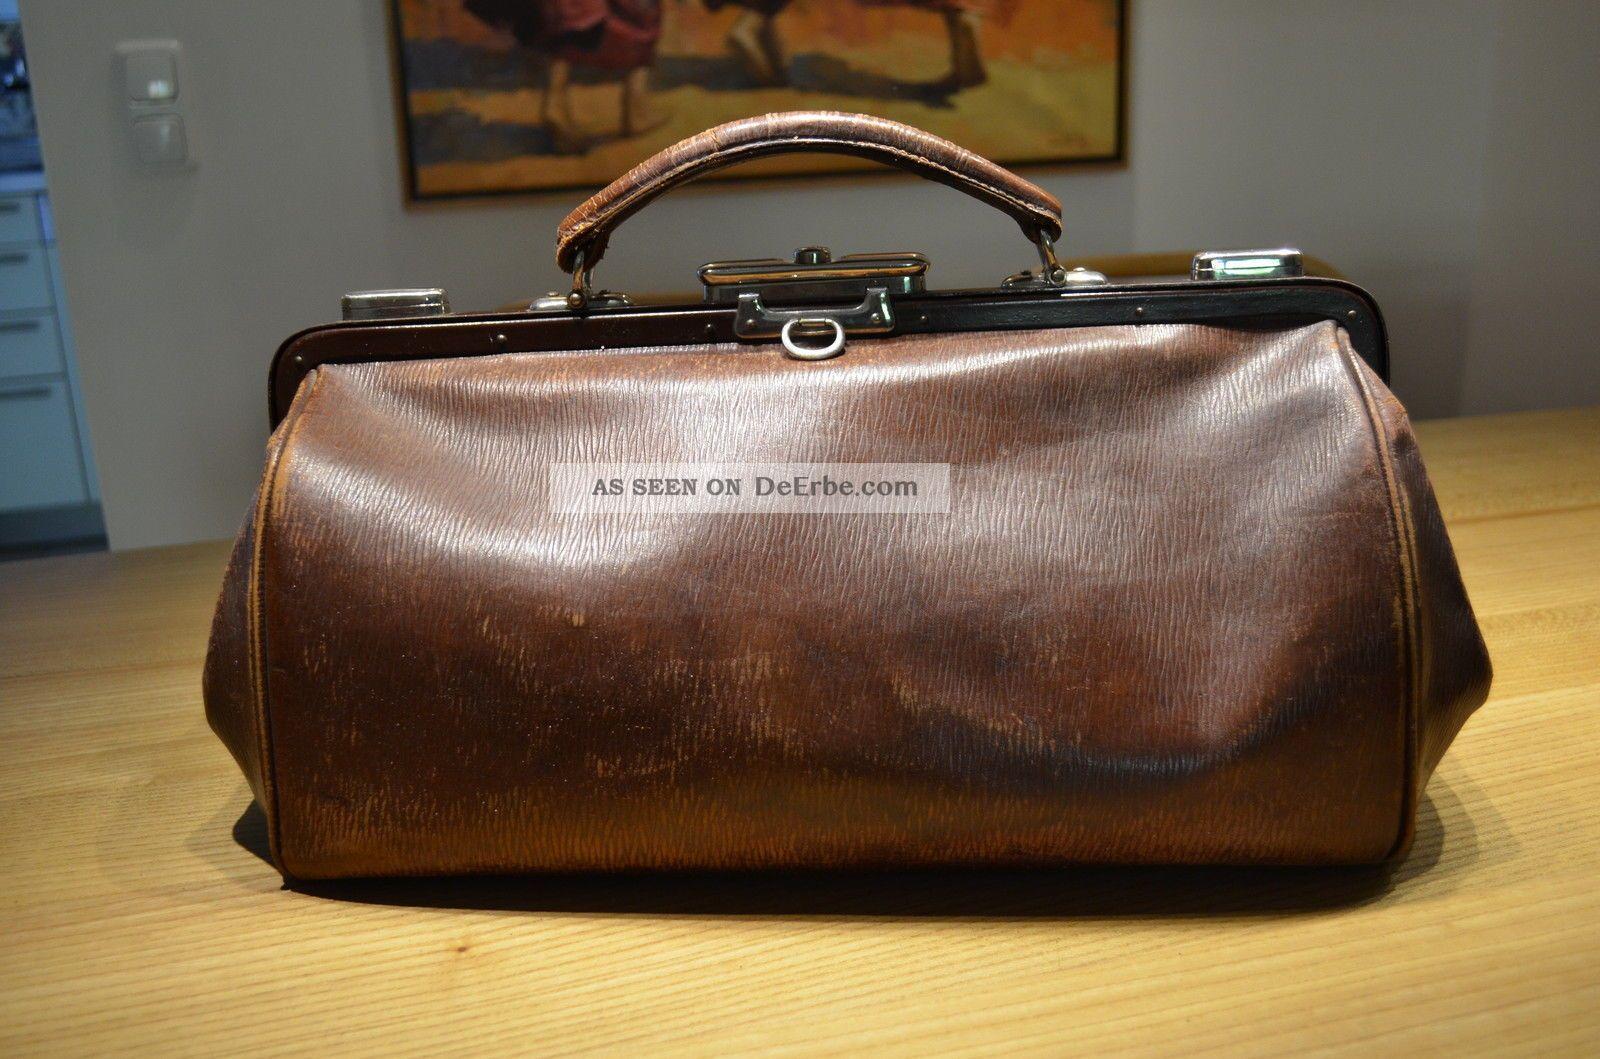 Antike Hebammen Koffertasche - Arzt Ledertasche Koffer Leder Tasche Um 1920 Arzt & Apotheker Bild